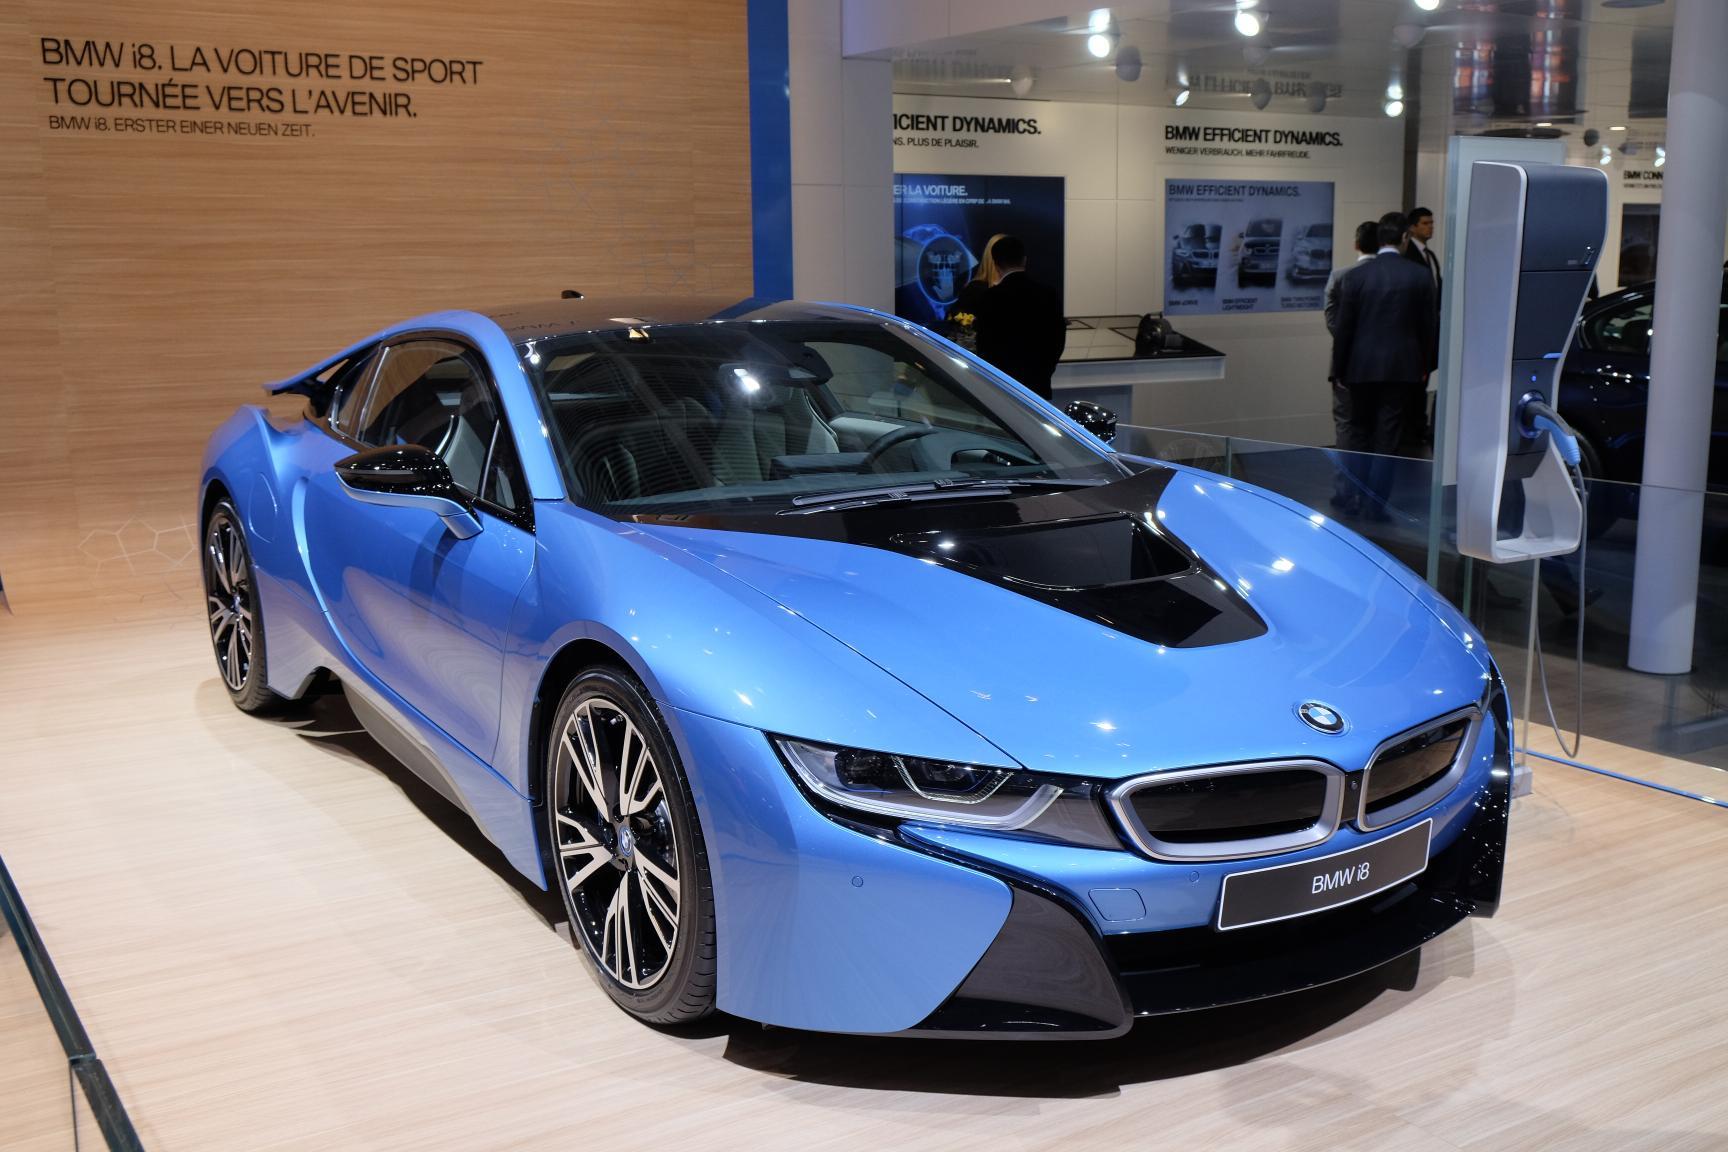 BMW-i8-occasion-7.jpg